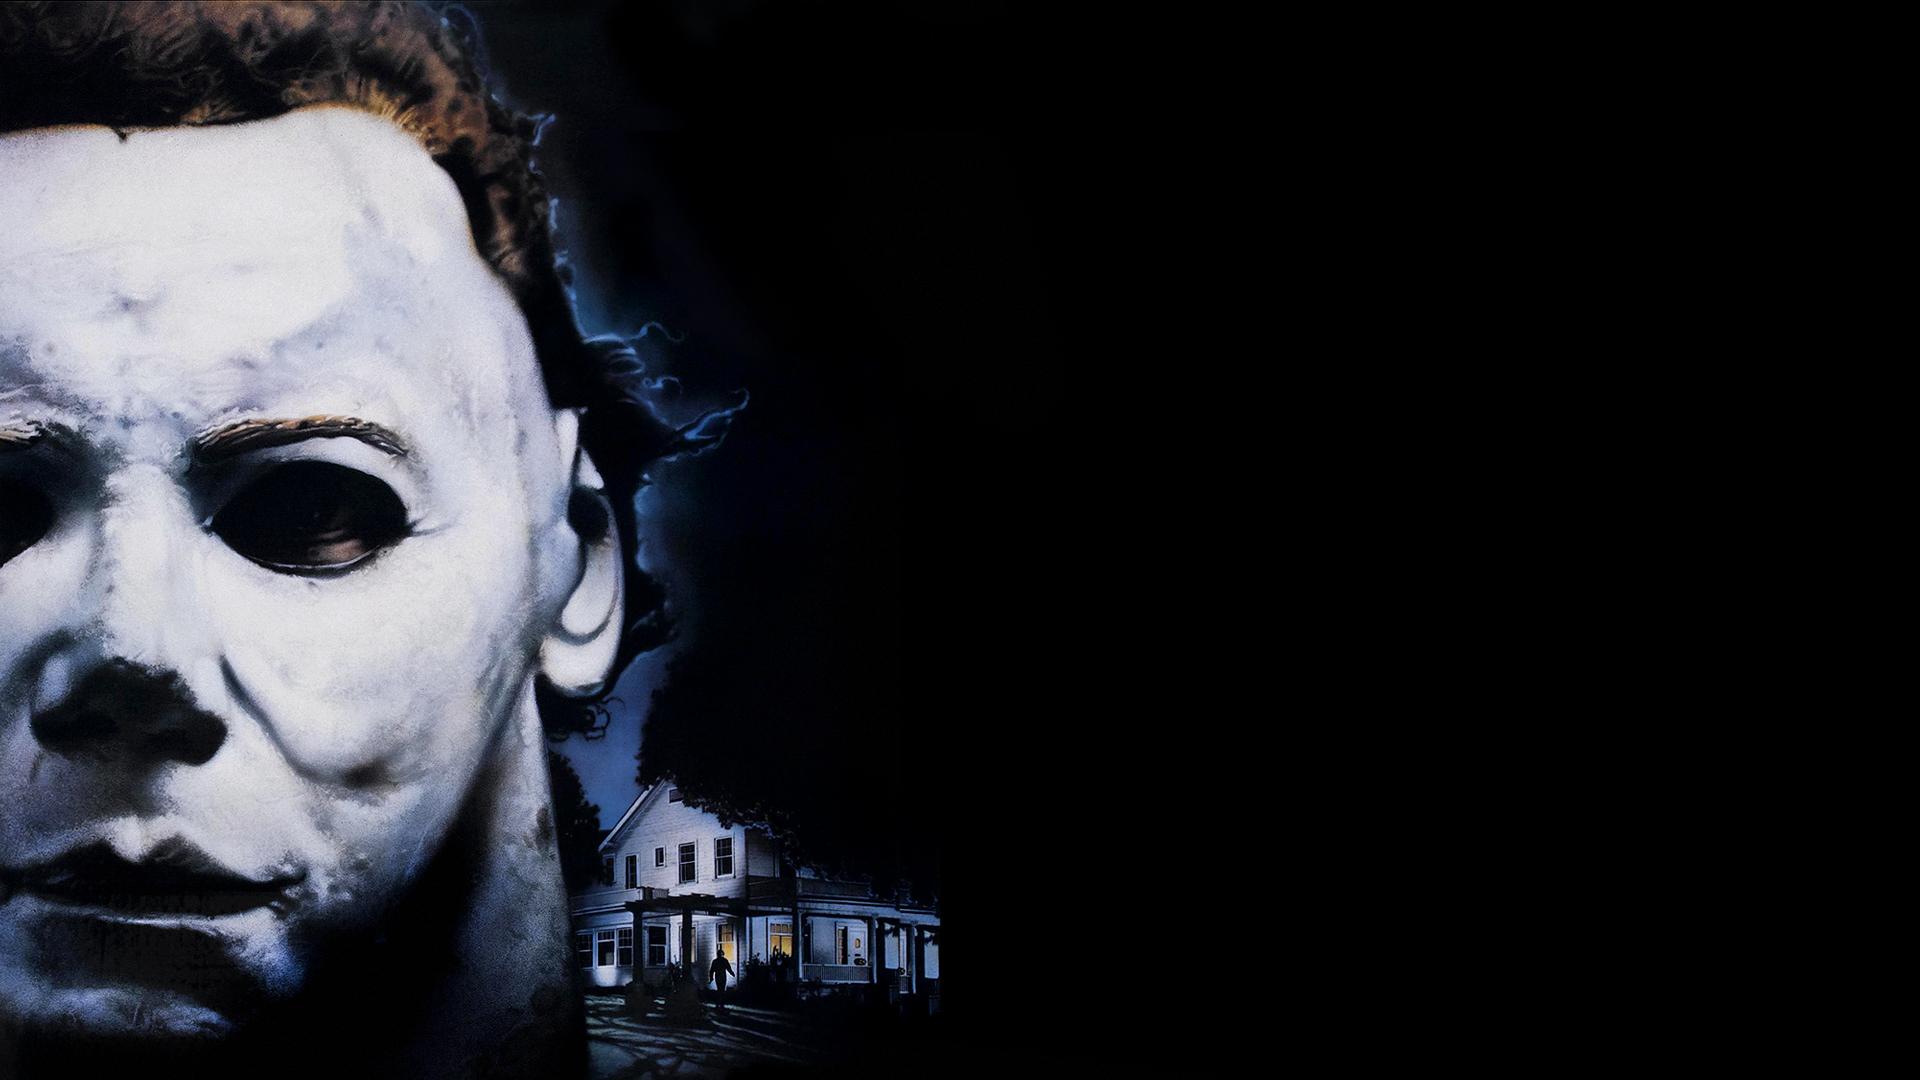 Halloween 4: The Return of Michael Myers | Movie fanart | fanart.tv